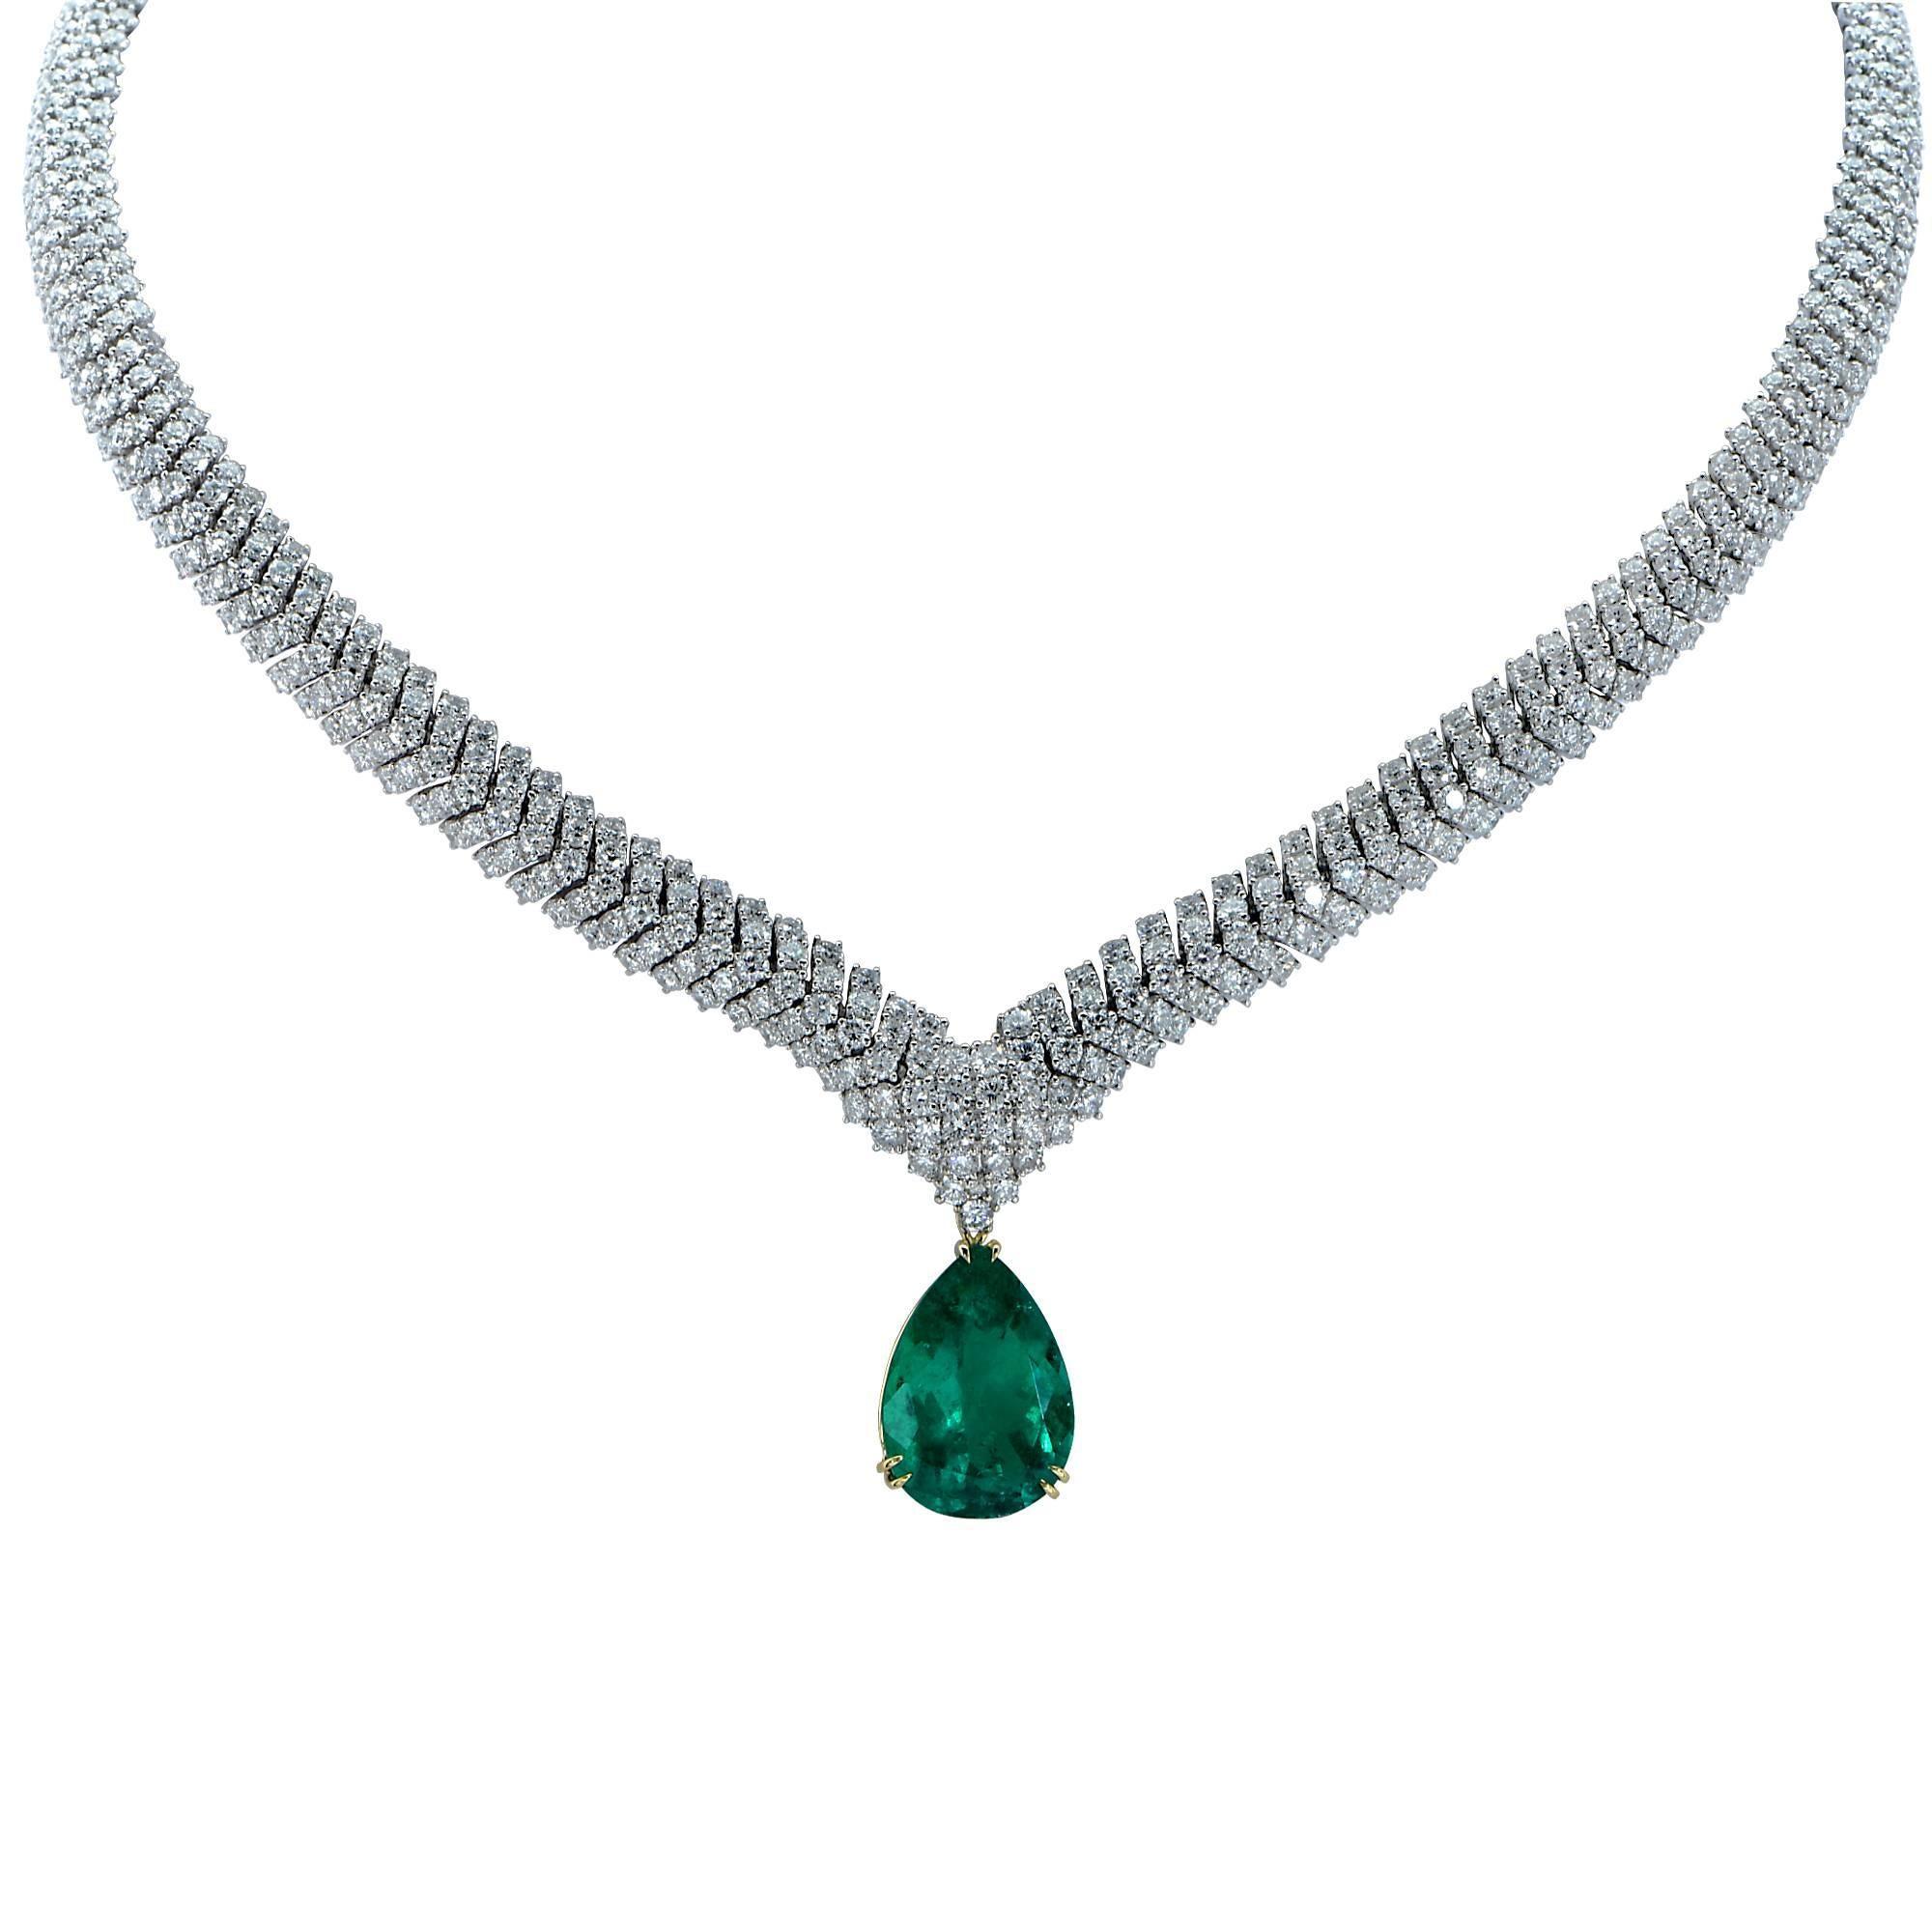 Vivid Diamonds Stunning Colombian Emerald and Diamond Necklace